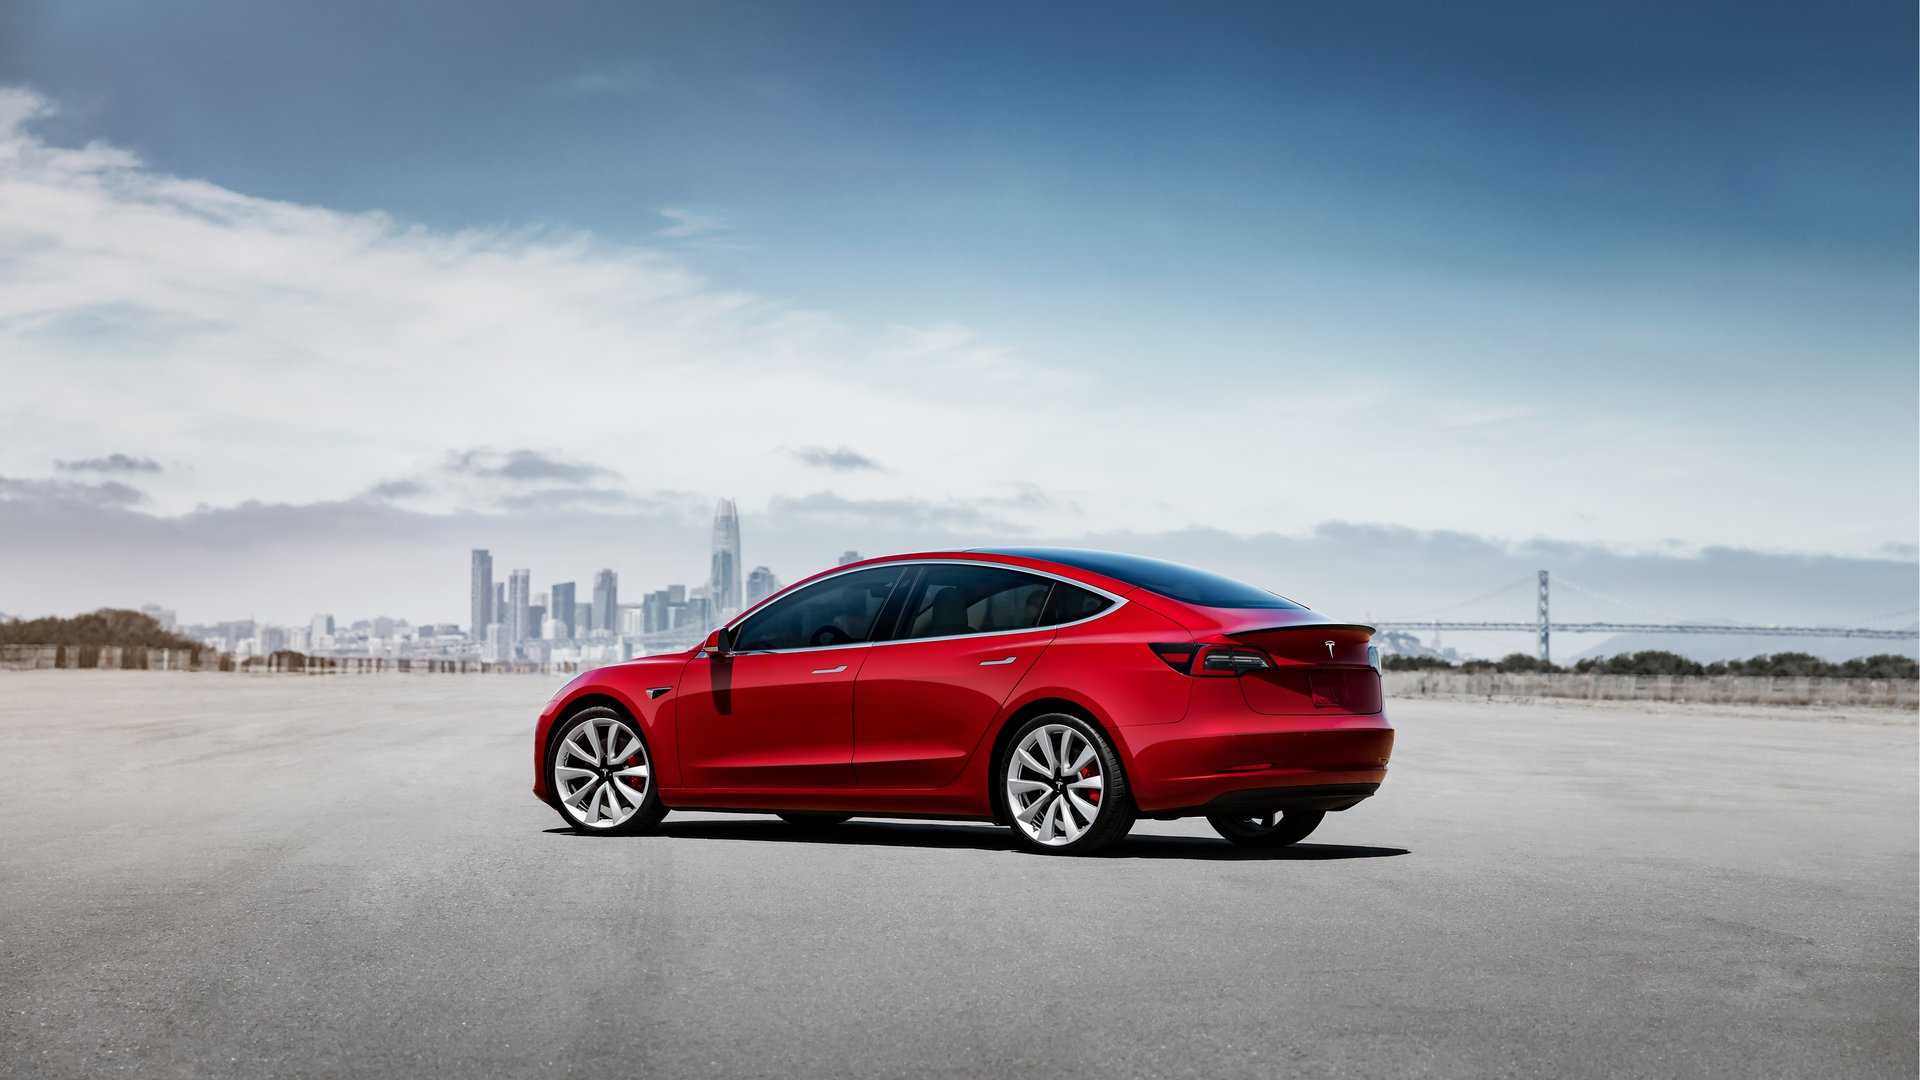 Strange: Tesla Model 3's Regeneration system not working with winter